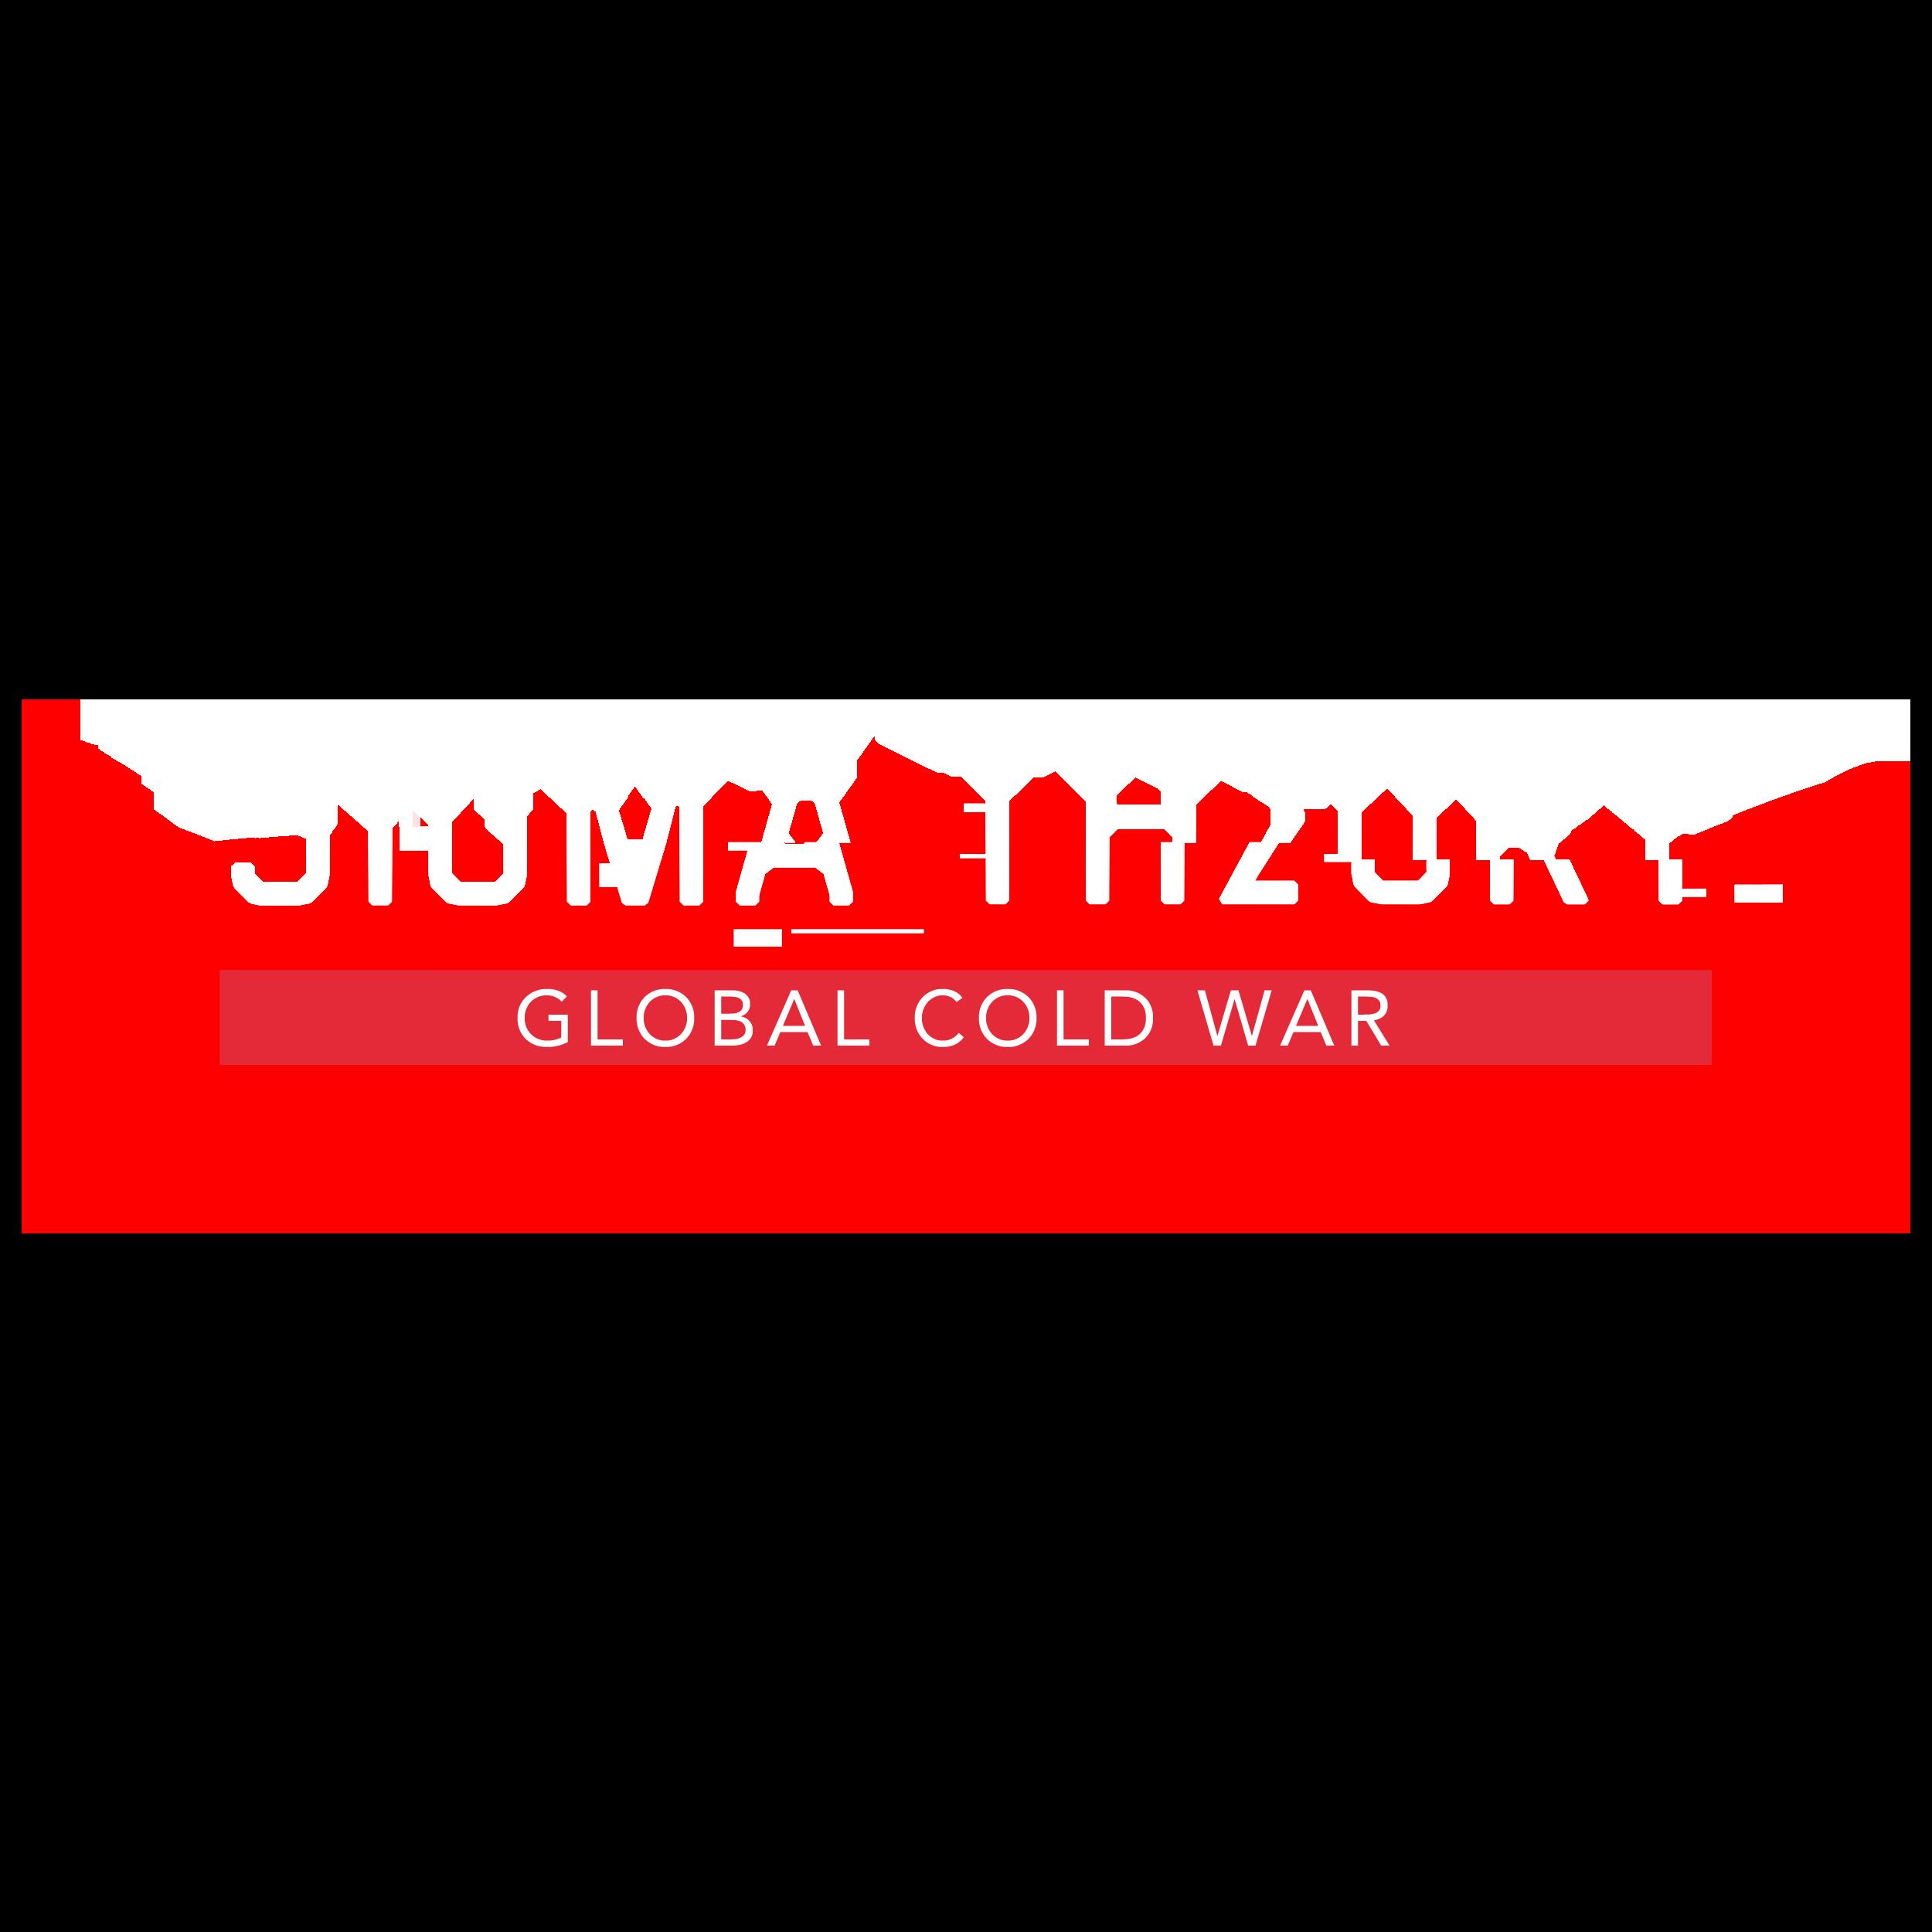 Sigma Theory logo